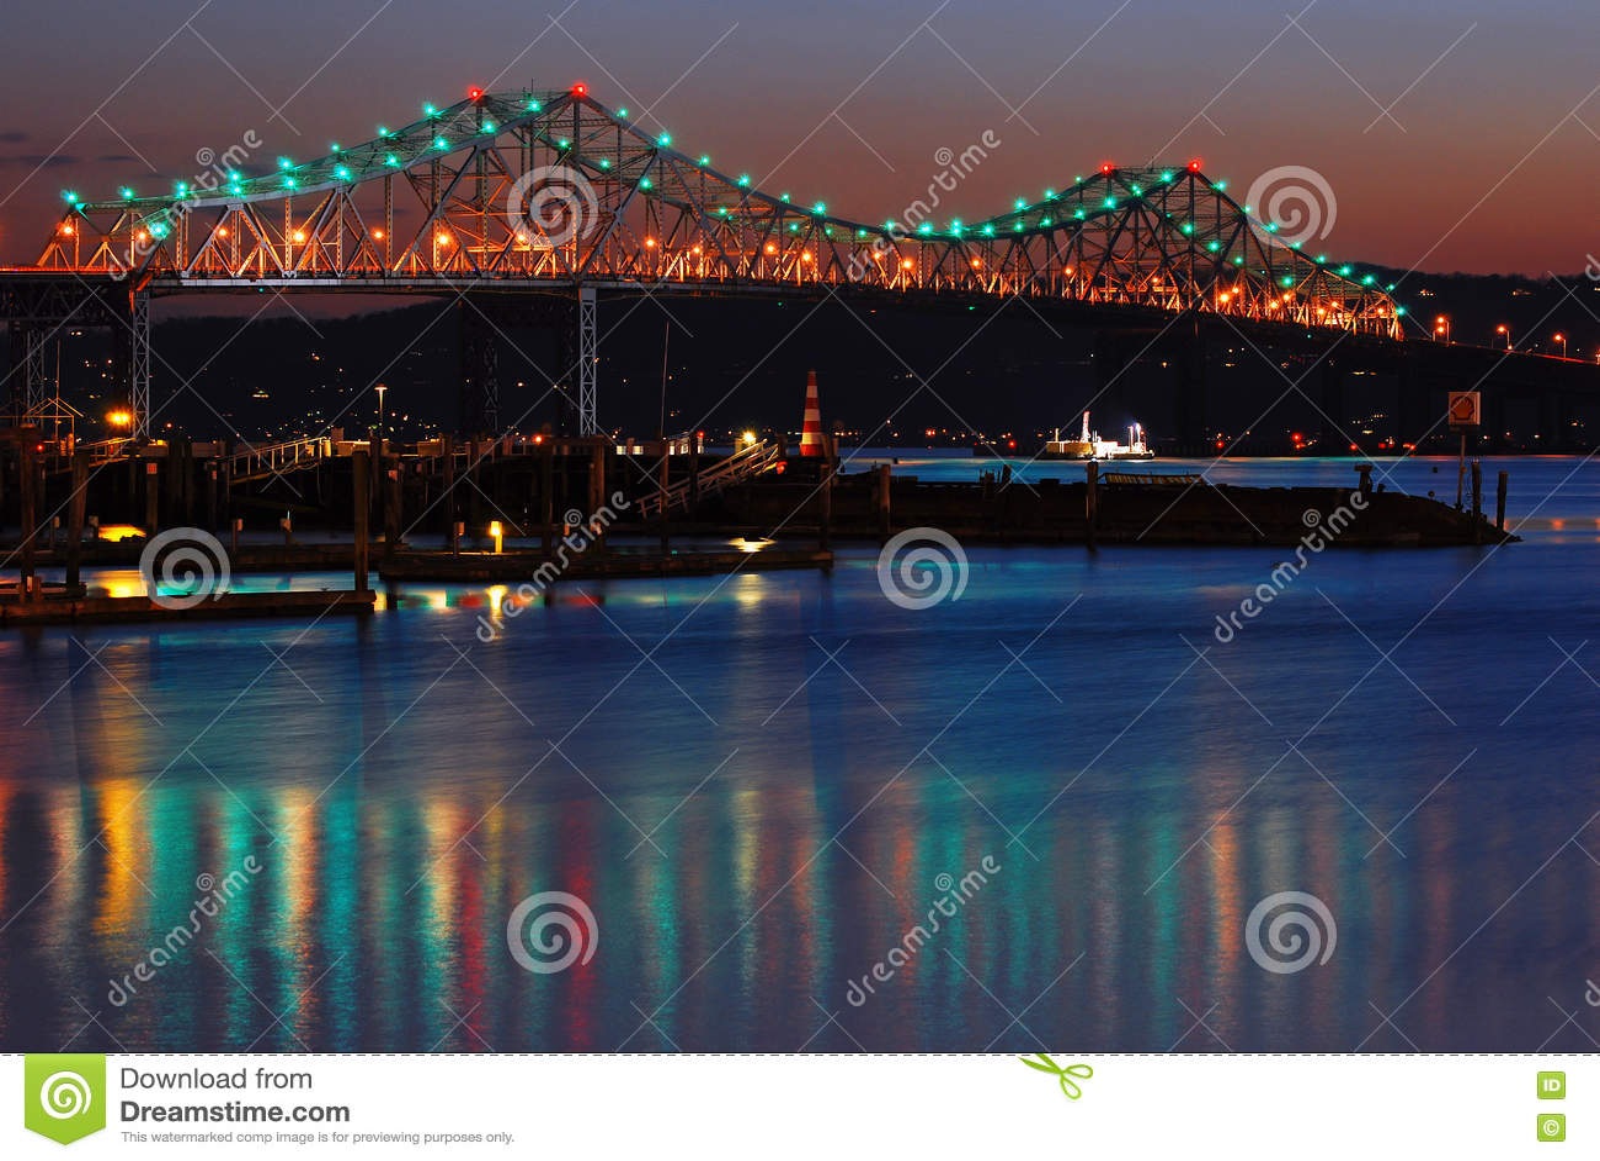 Le vieux pont de Tappan Zee enjambe le Hudson